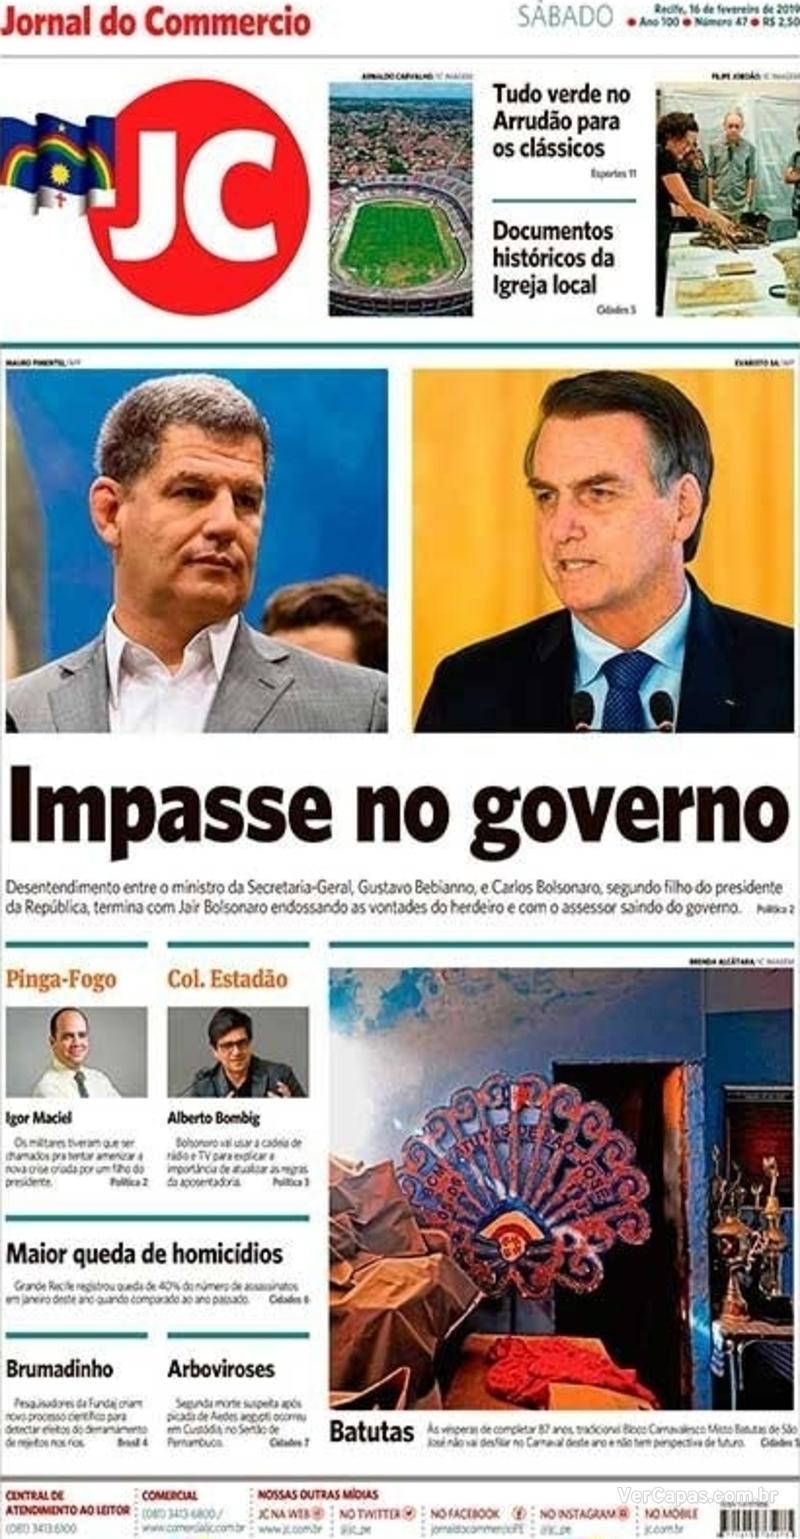 Capa Jornal do Commercio 2019-02-16